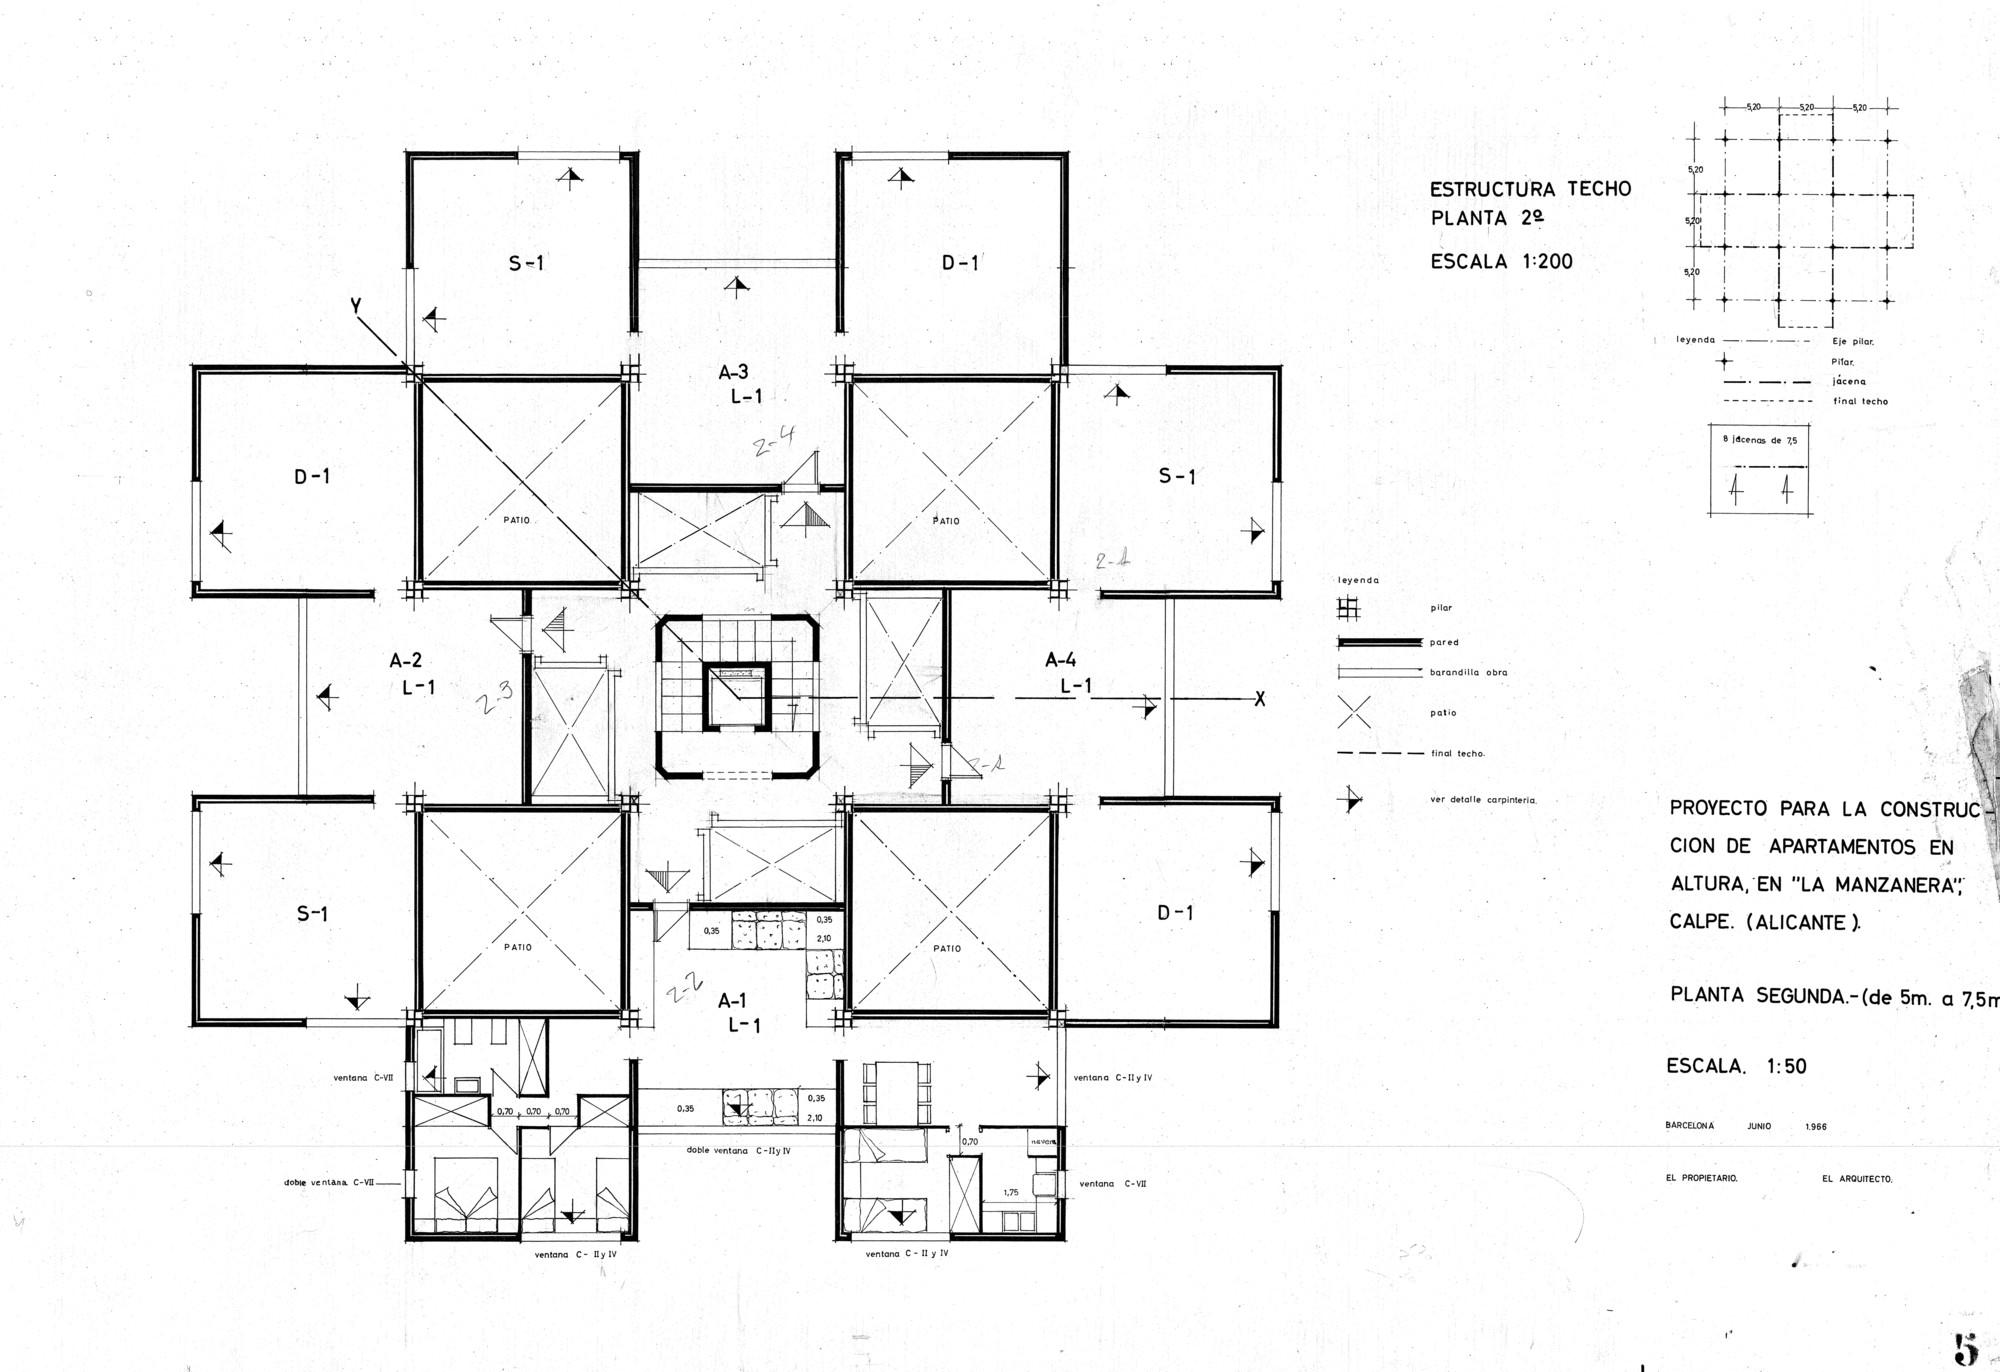 Gallery of ad classics xanad ricardo bofill 16 for Plan de arquitectura